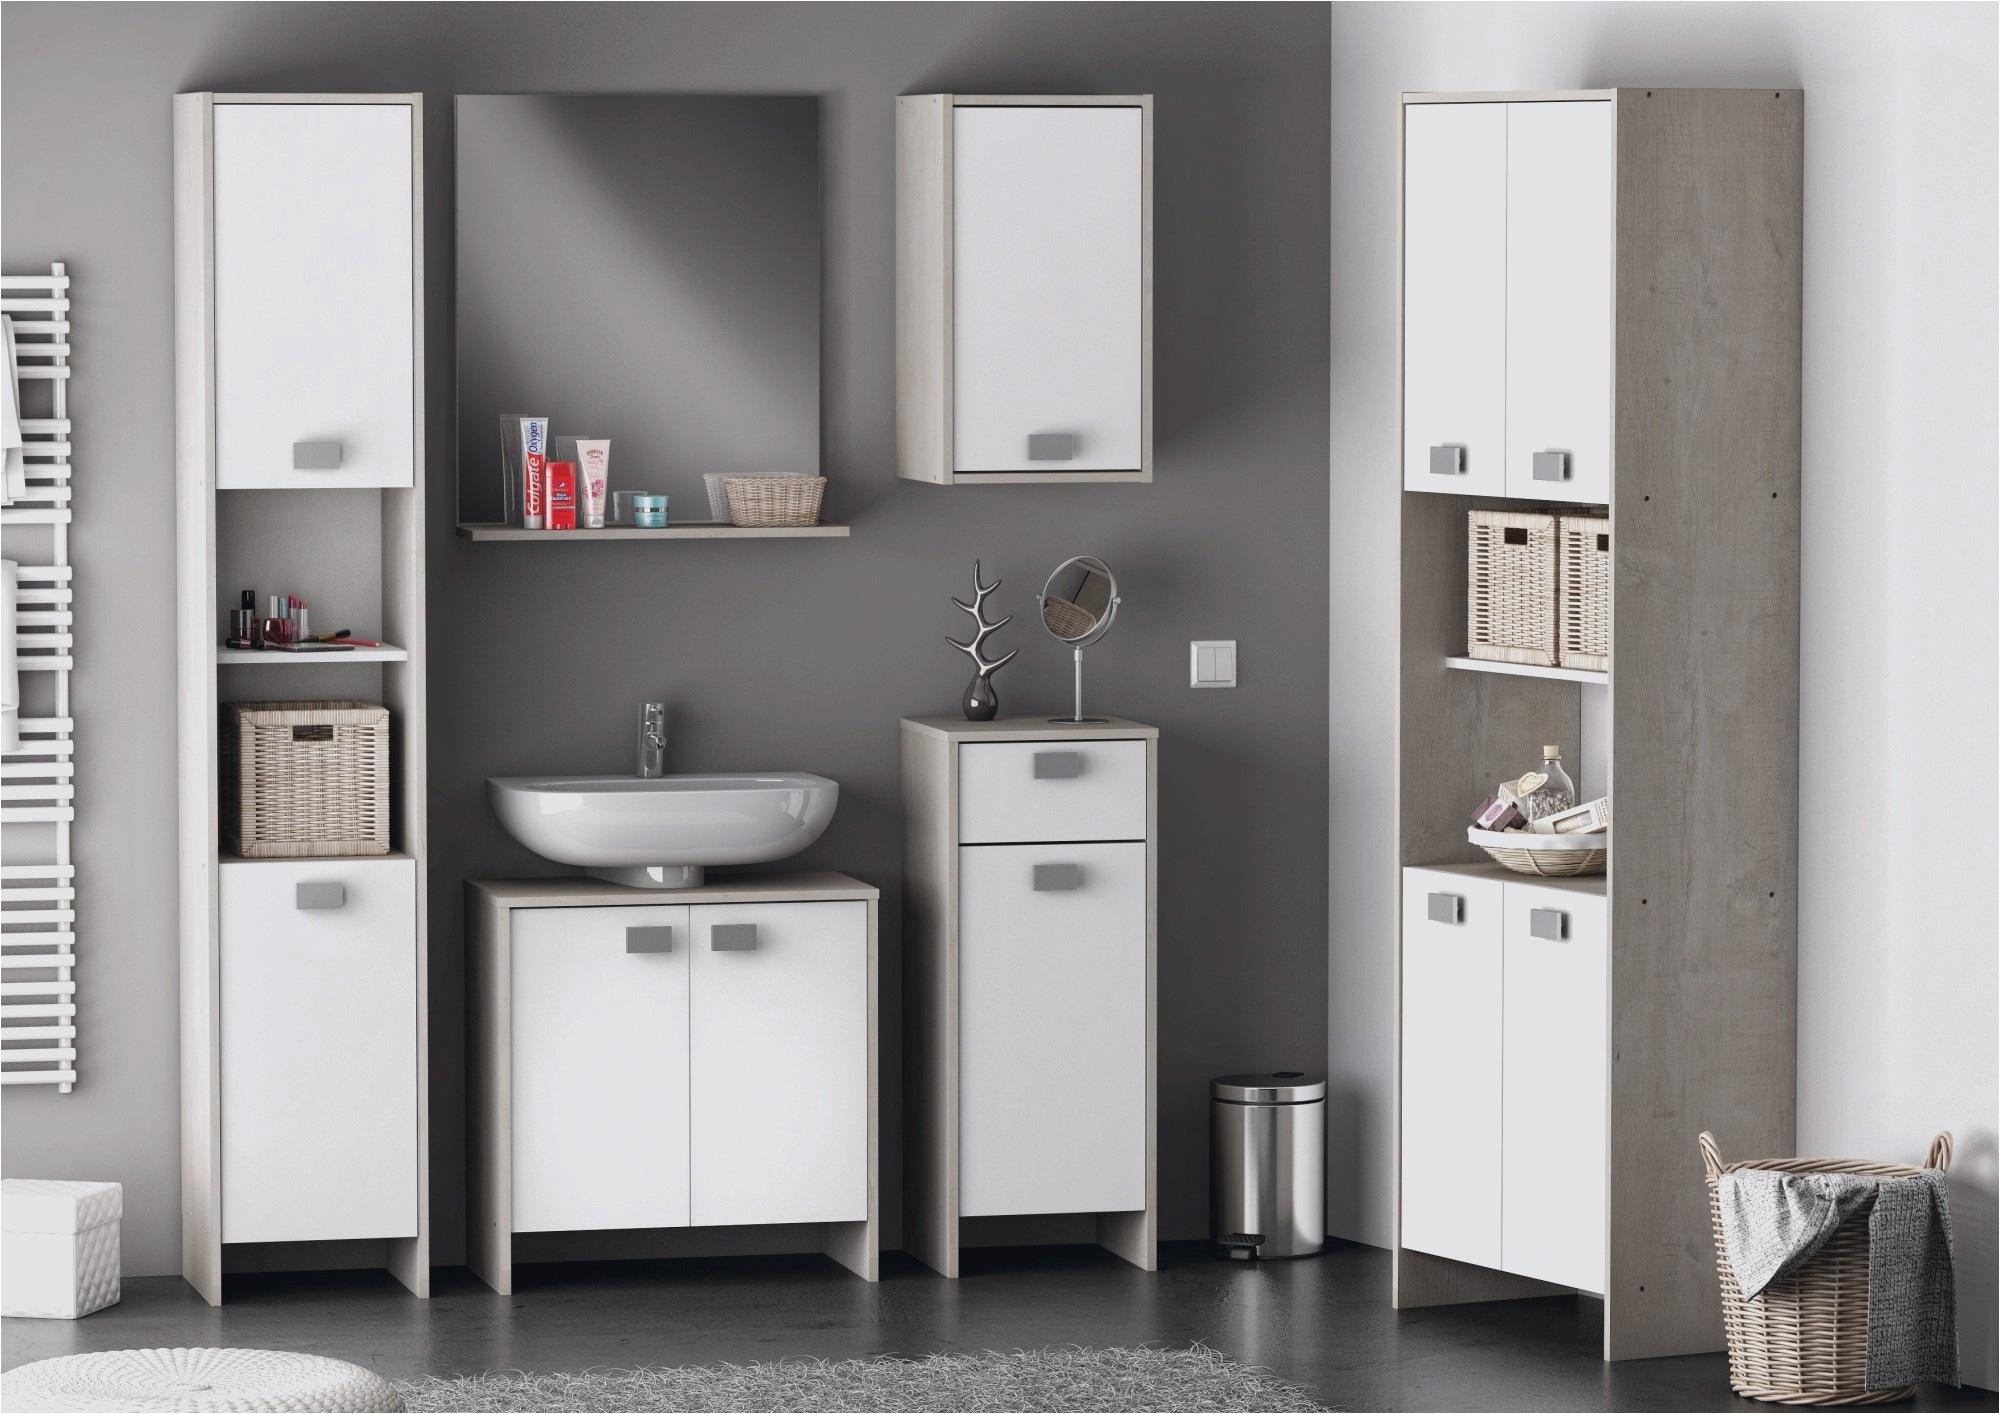 Norme electrique salle de bain chauffage